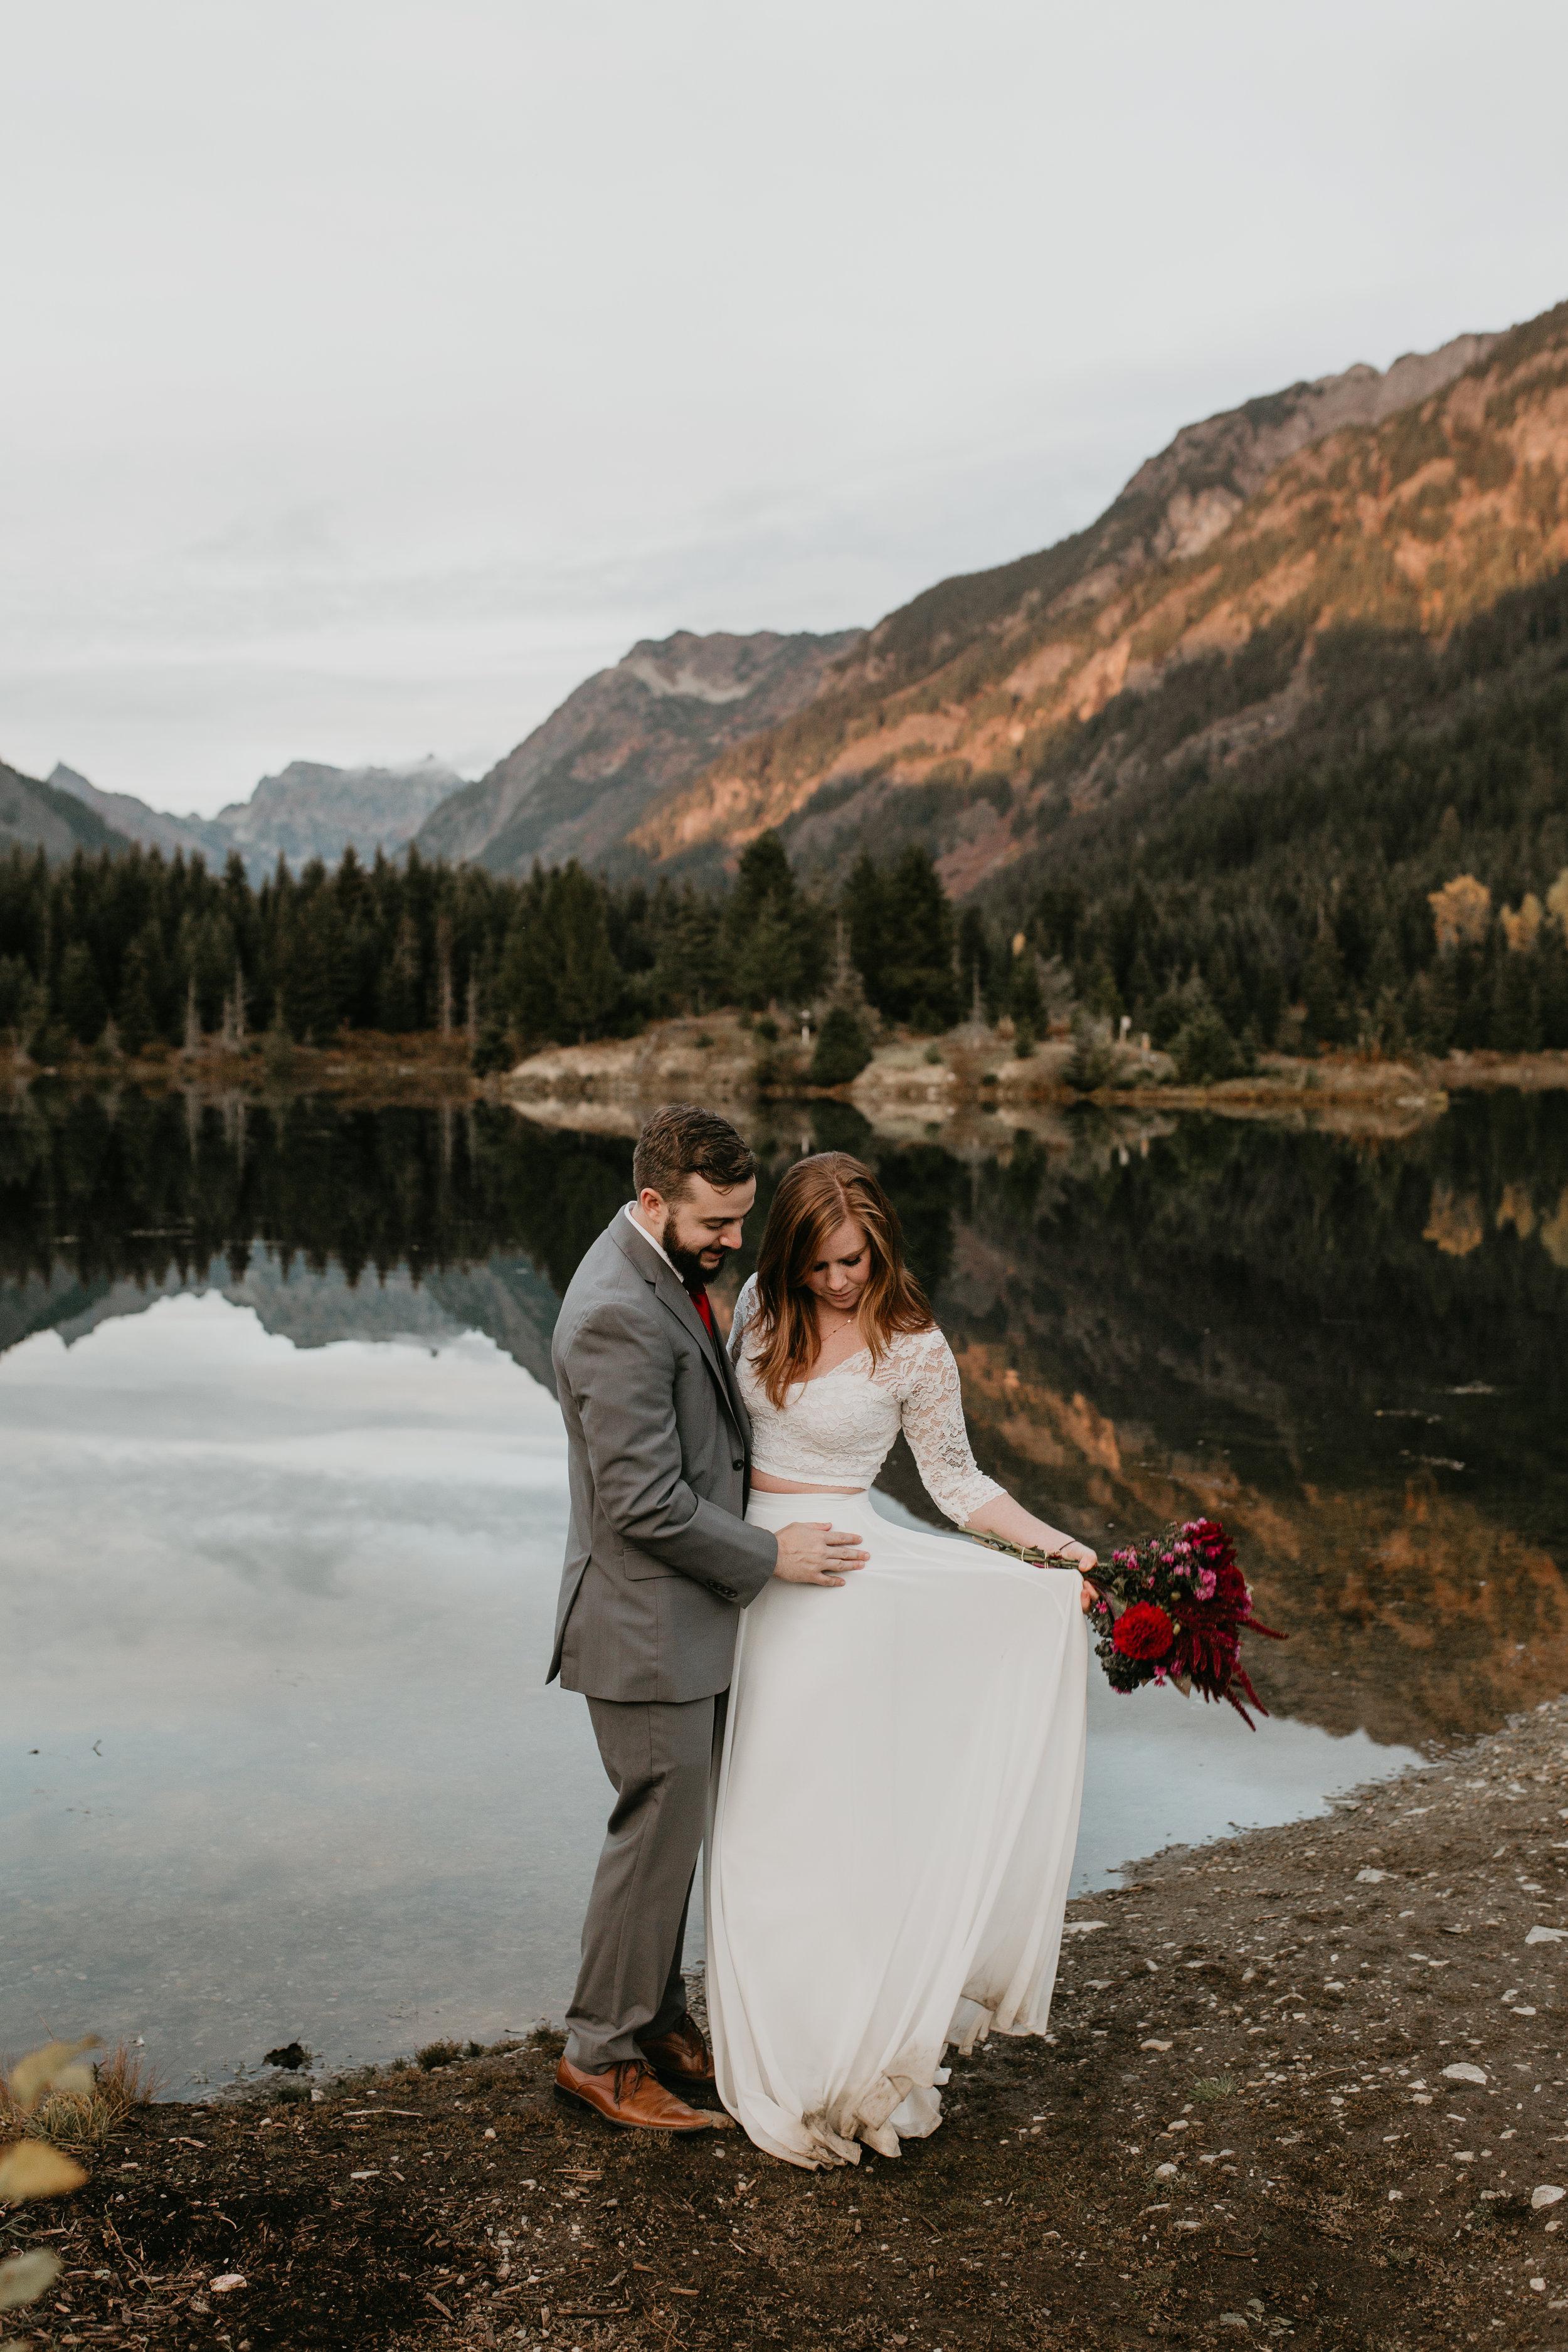 nicole-daacke-photography-mountain-view-elopement-at-gold-creek-pond-snoqualmie-washington-wa-elopement-photographer-photography-adventure-elopement-in-washington-fall-lakeside-golden-sunset-boho-fun-bride-0556.jpg